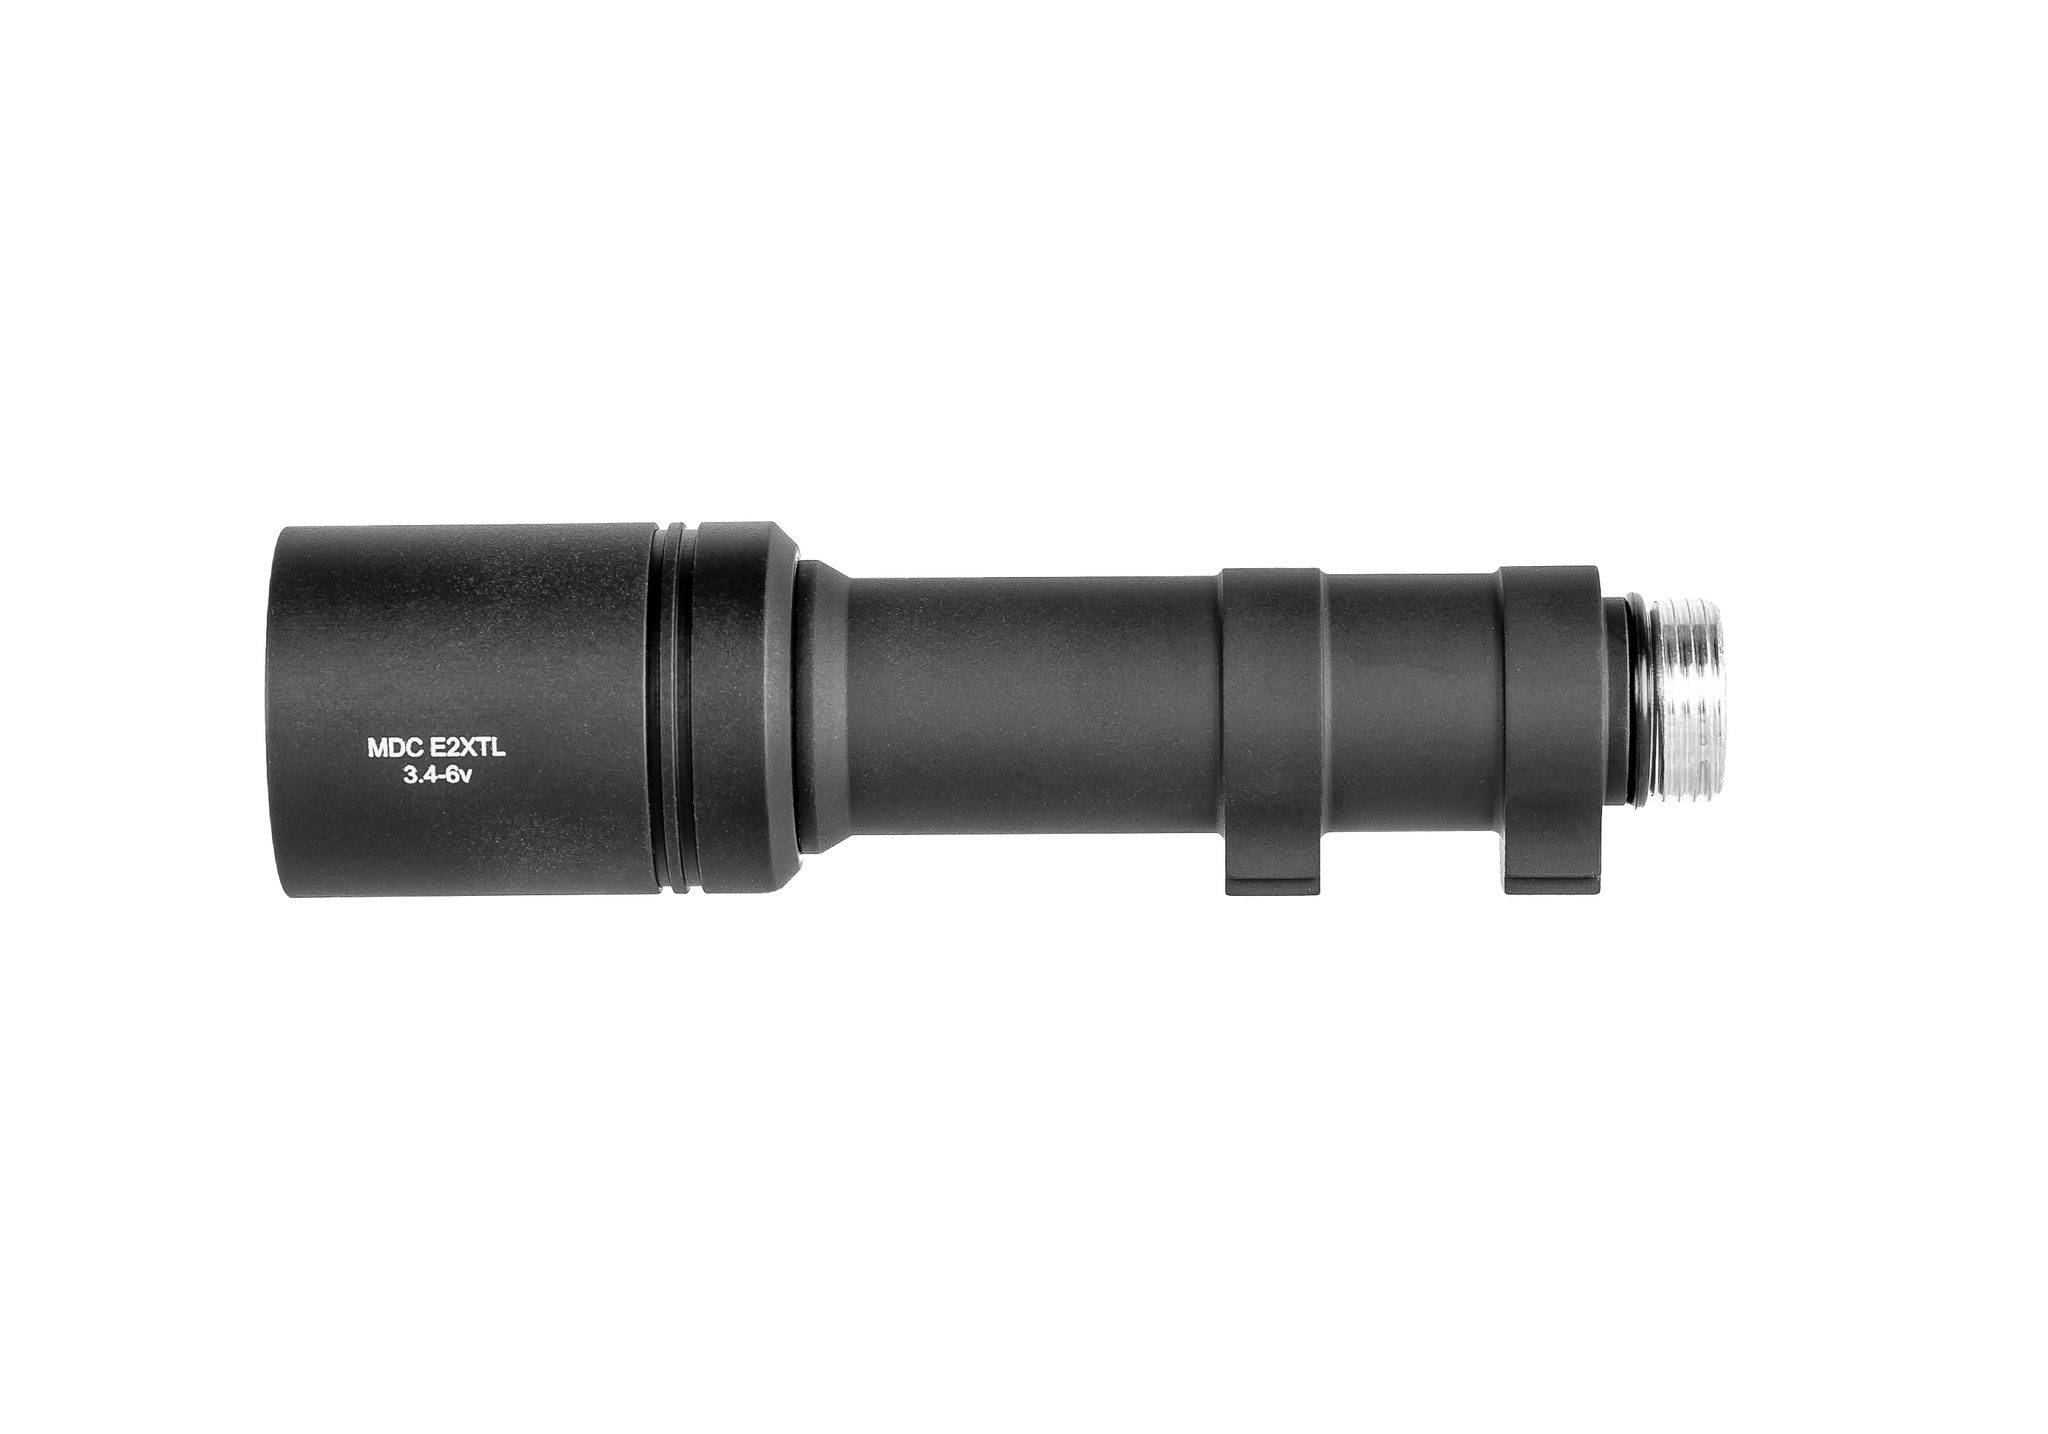 arisaka defense 18650 series weapon lights